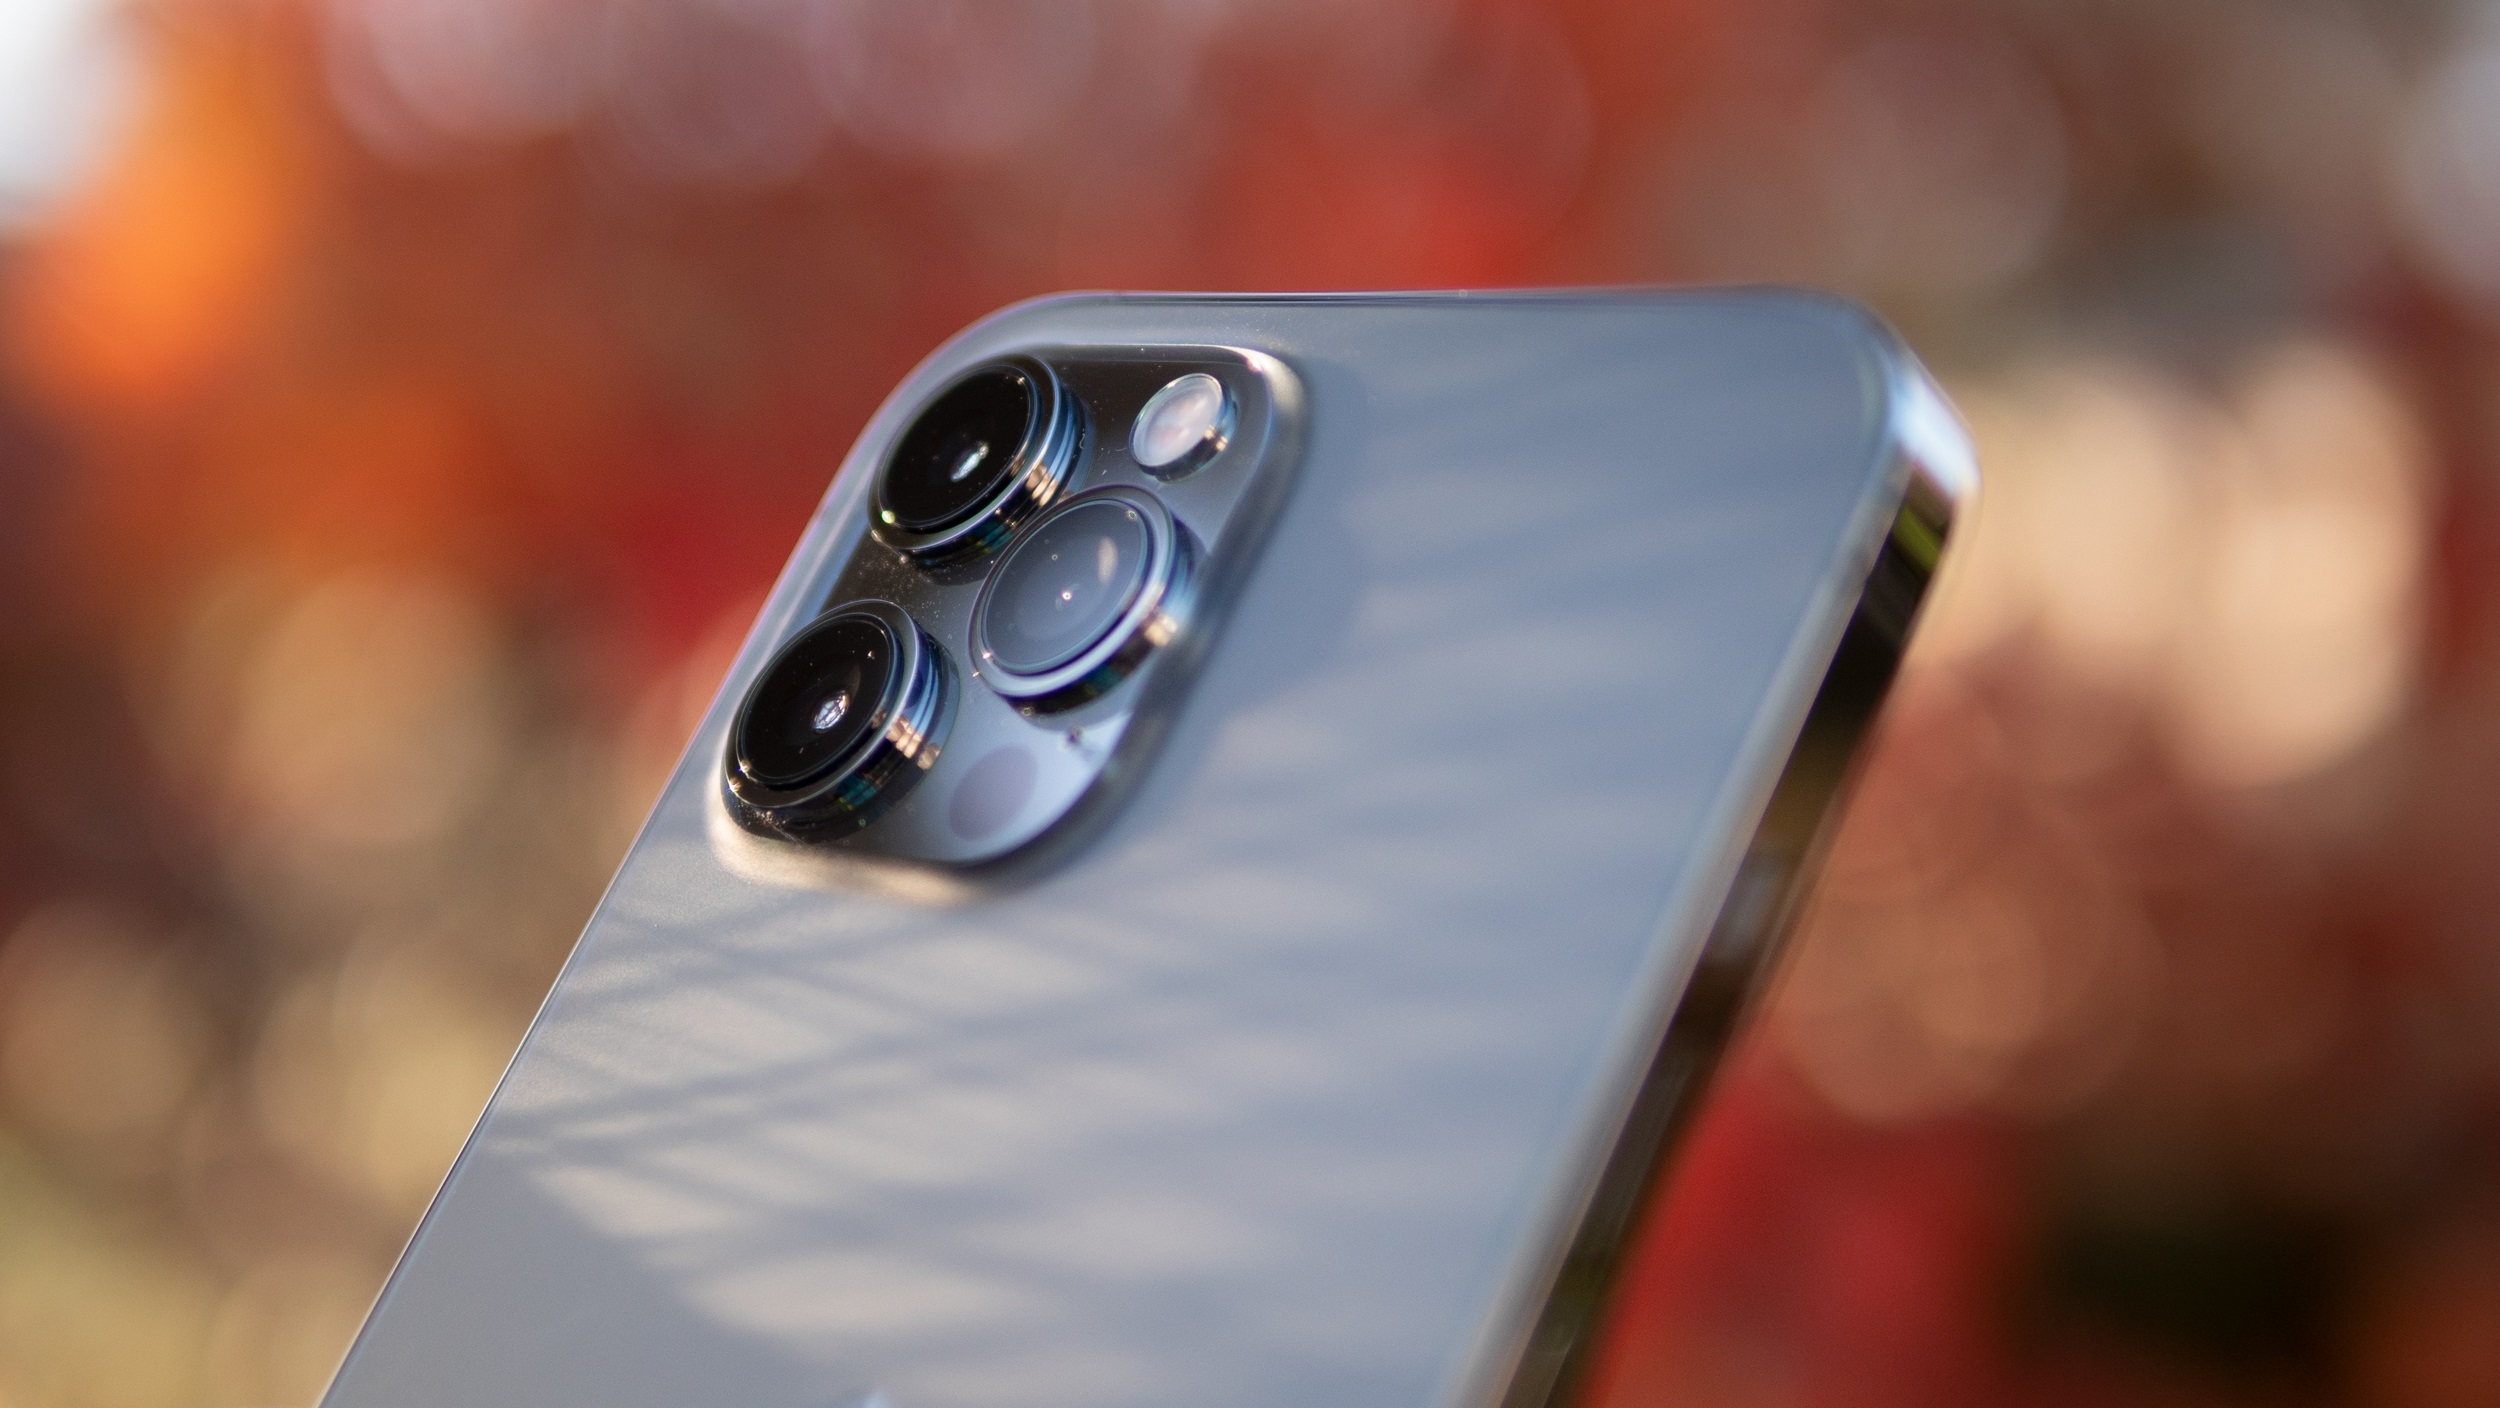 تصاویر آیفون 12 پرومکس - iphone 12 pro max